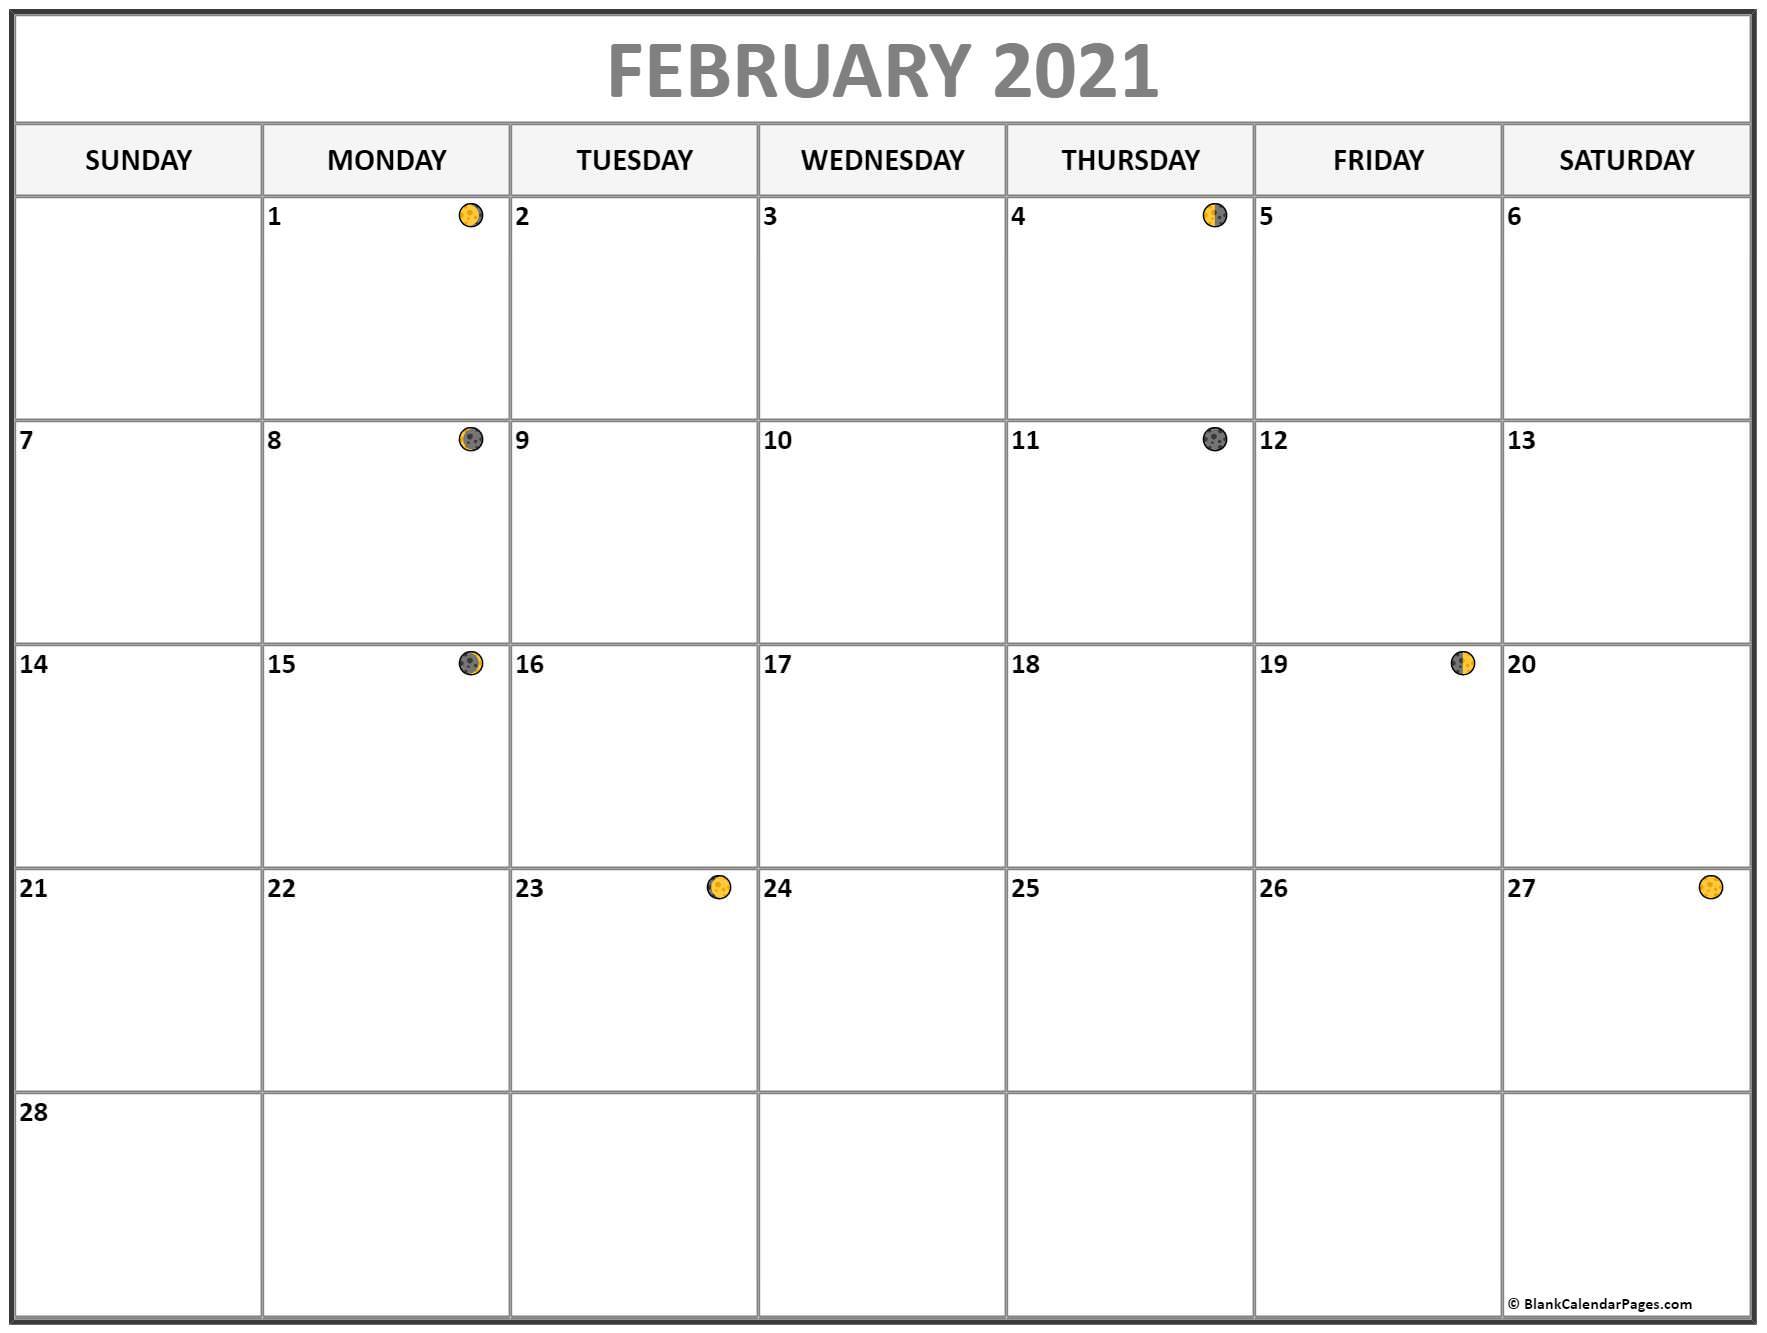 February 2021 Lunar Calendar   Moon Phase Calendar Inside Moon Calendar 2021 Name And Date For Kids